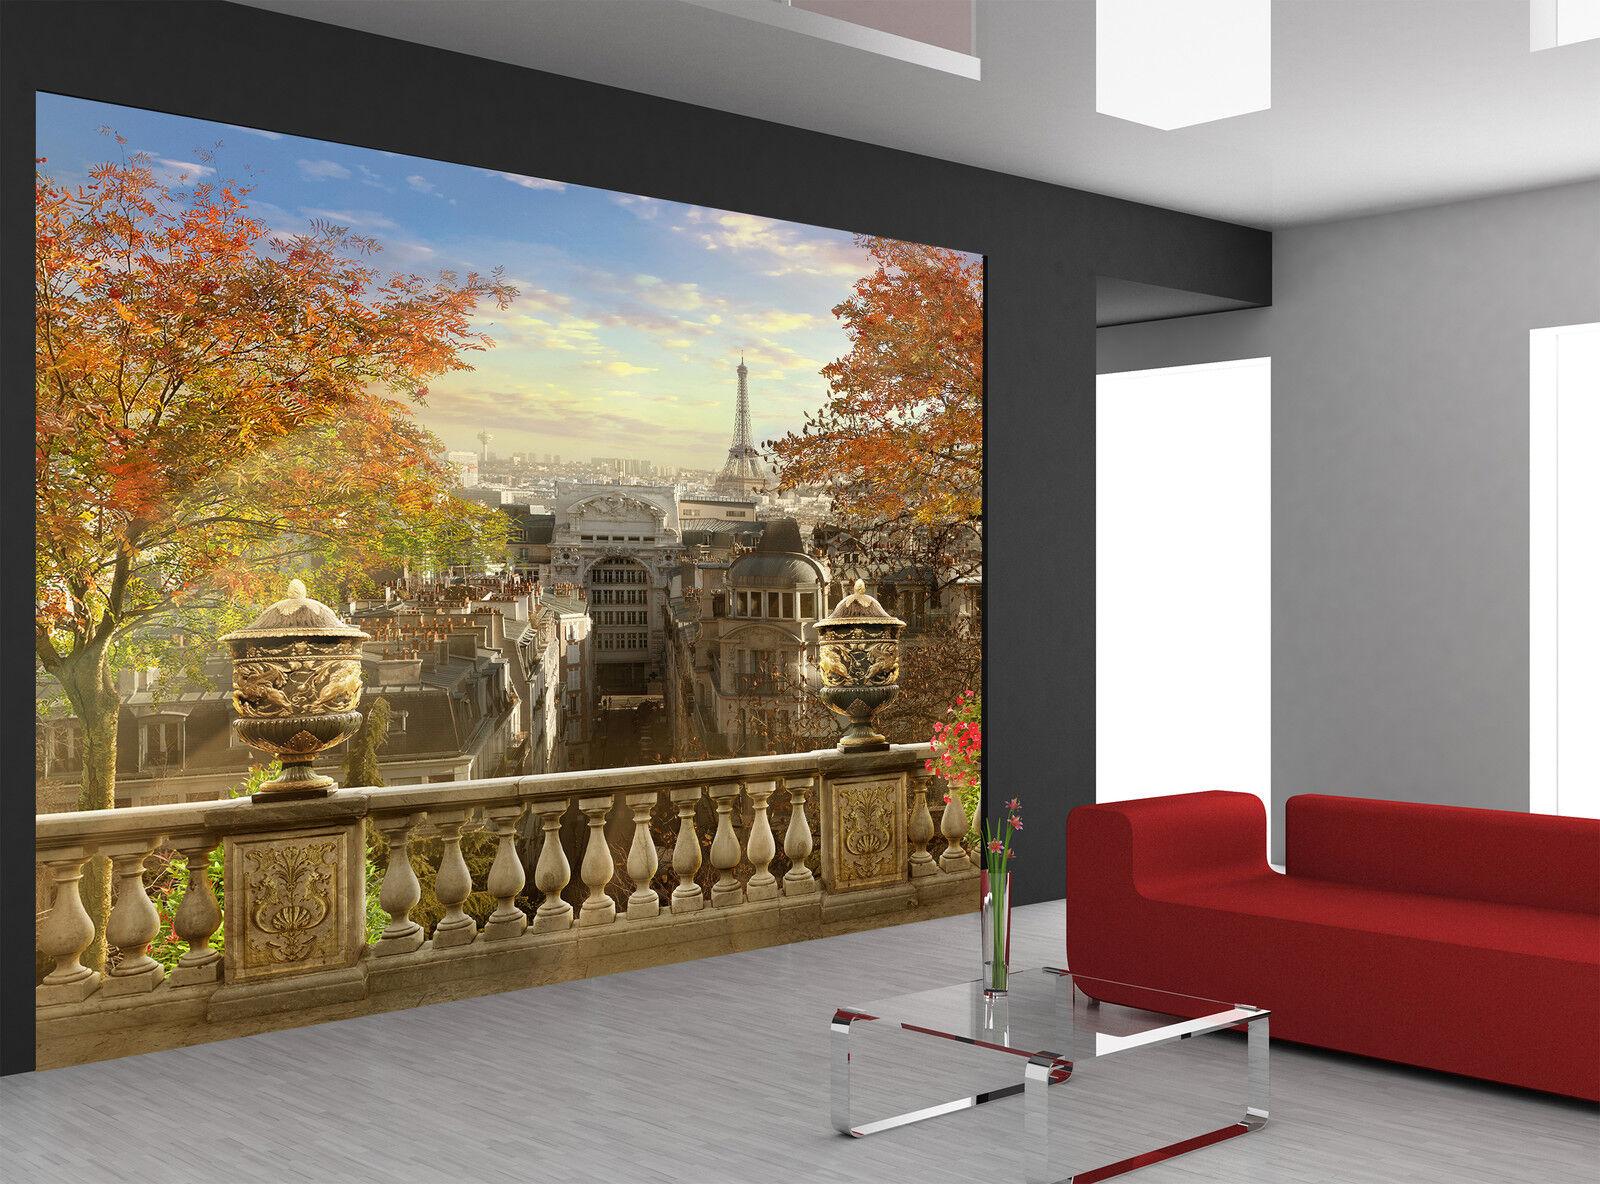 Paris -Montmartre Wall Mural Photo Wallpaper GIANT DECOR Paper Poster Free Paste